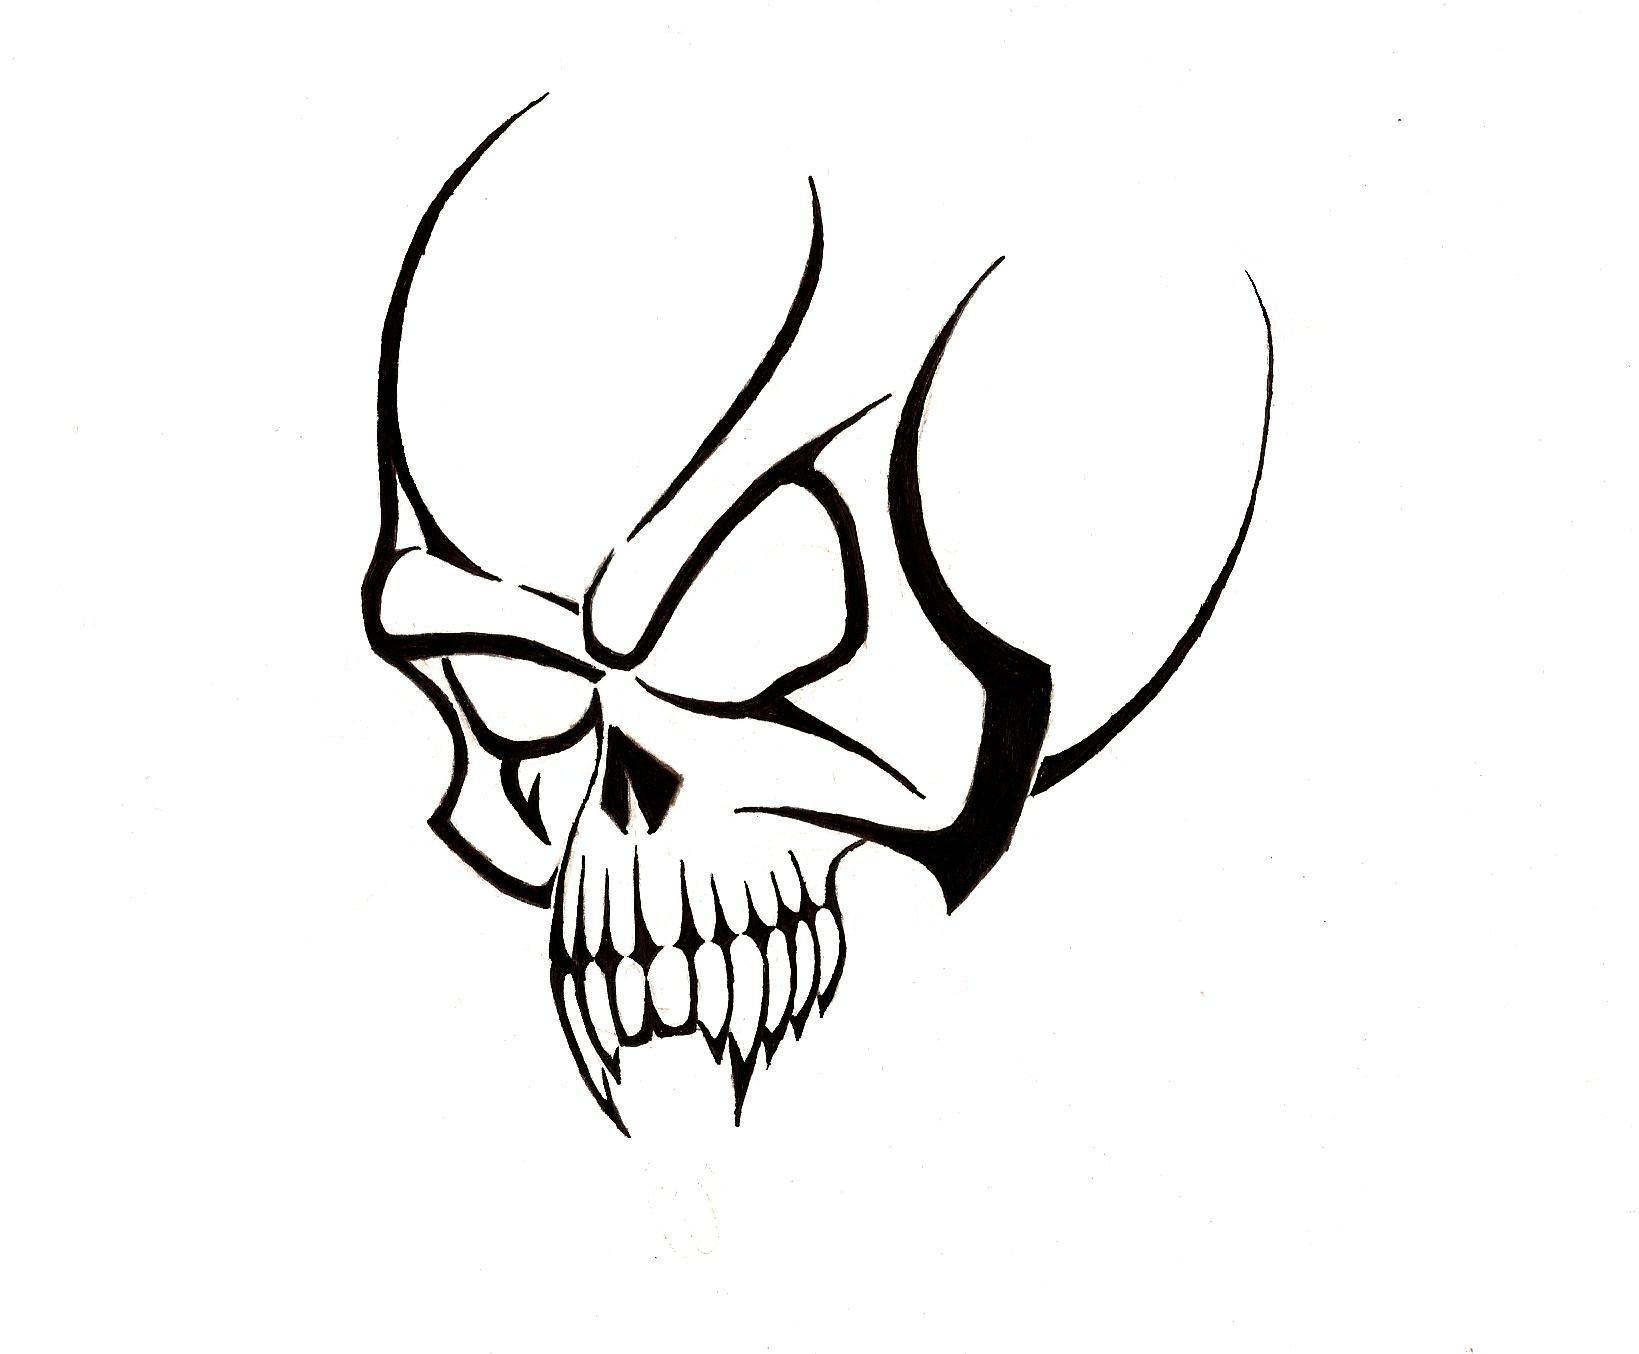 Free Skull Tattoo Designs To Print Clipart Best Tengkorak Rantai